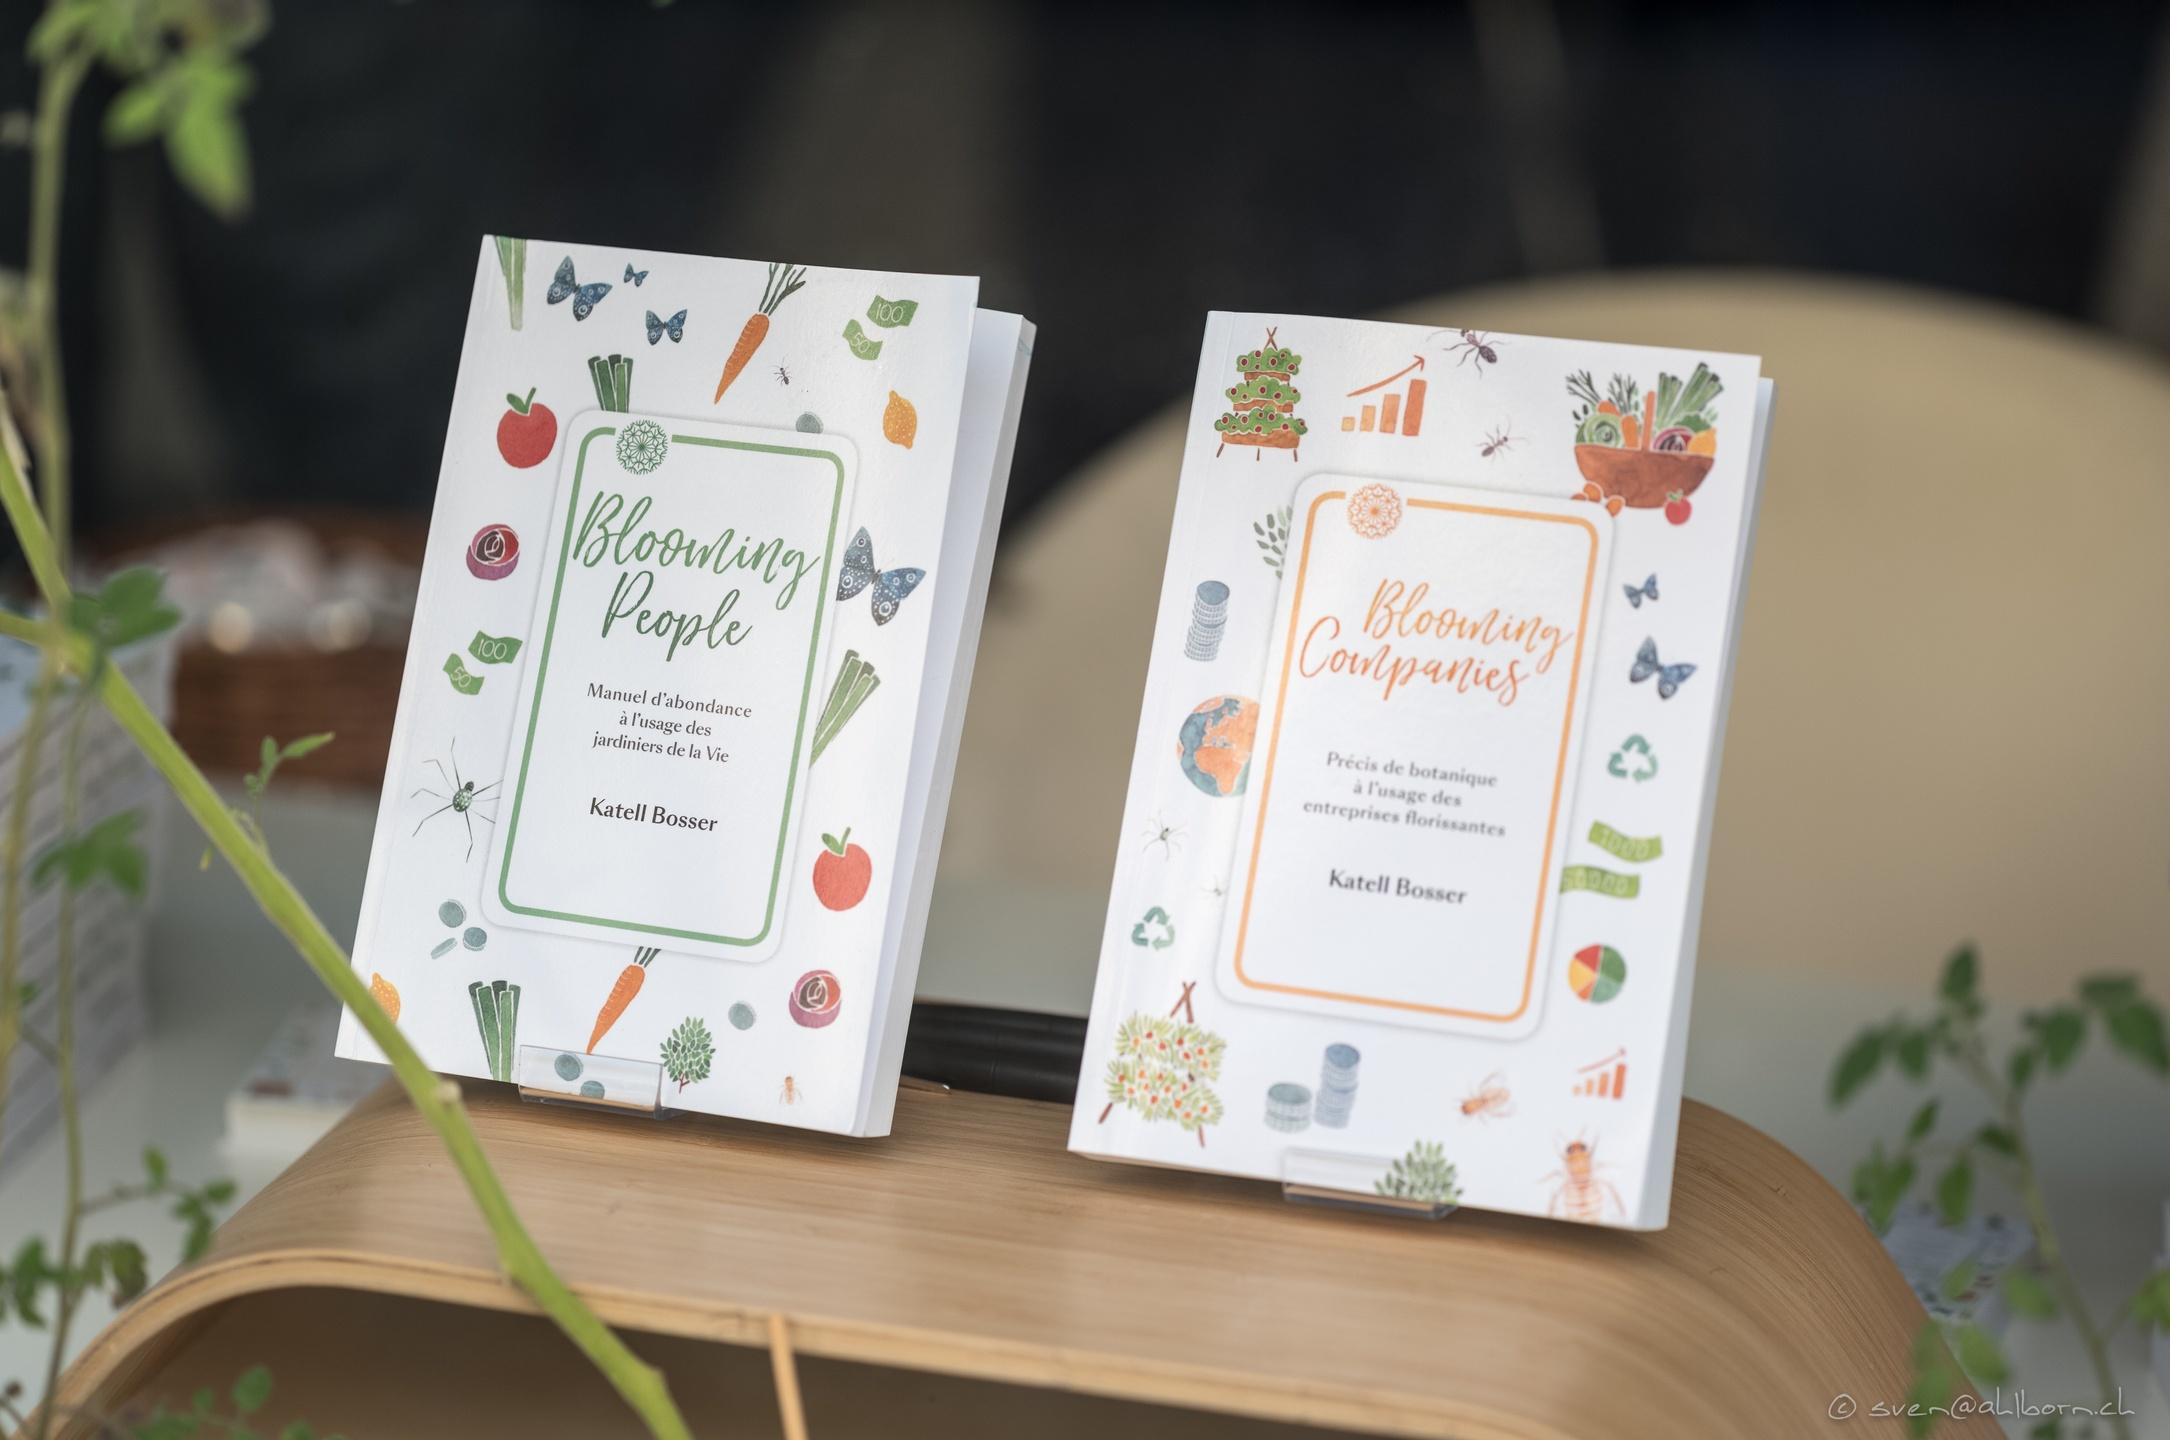 Les livres Blooming People et Blooming Companies